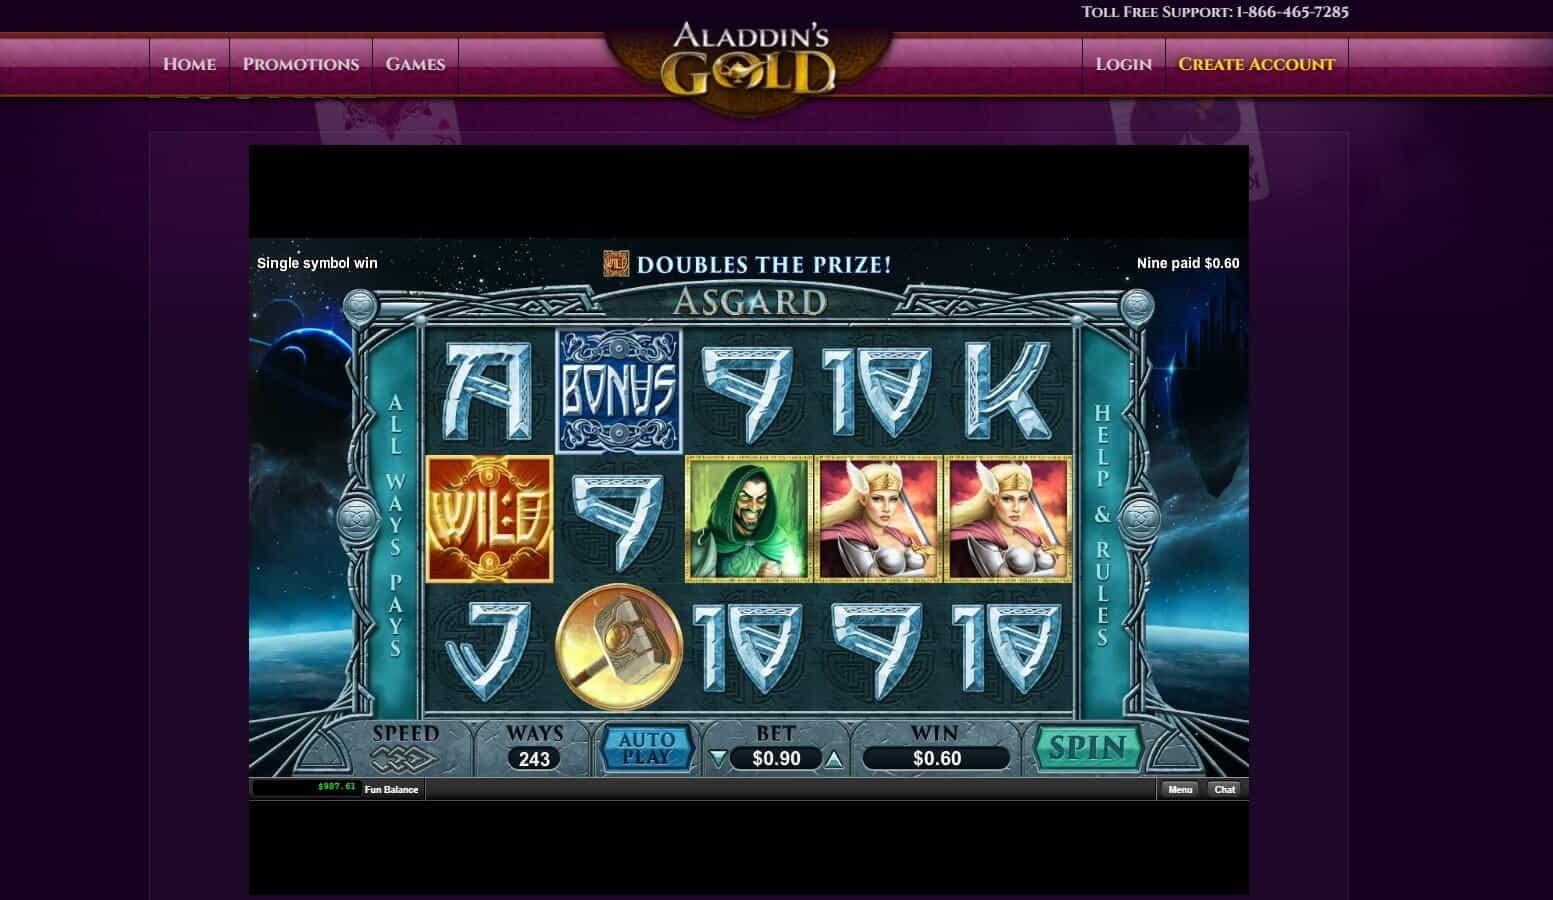 Aladdins Gold Casino Asgard Slot